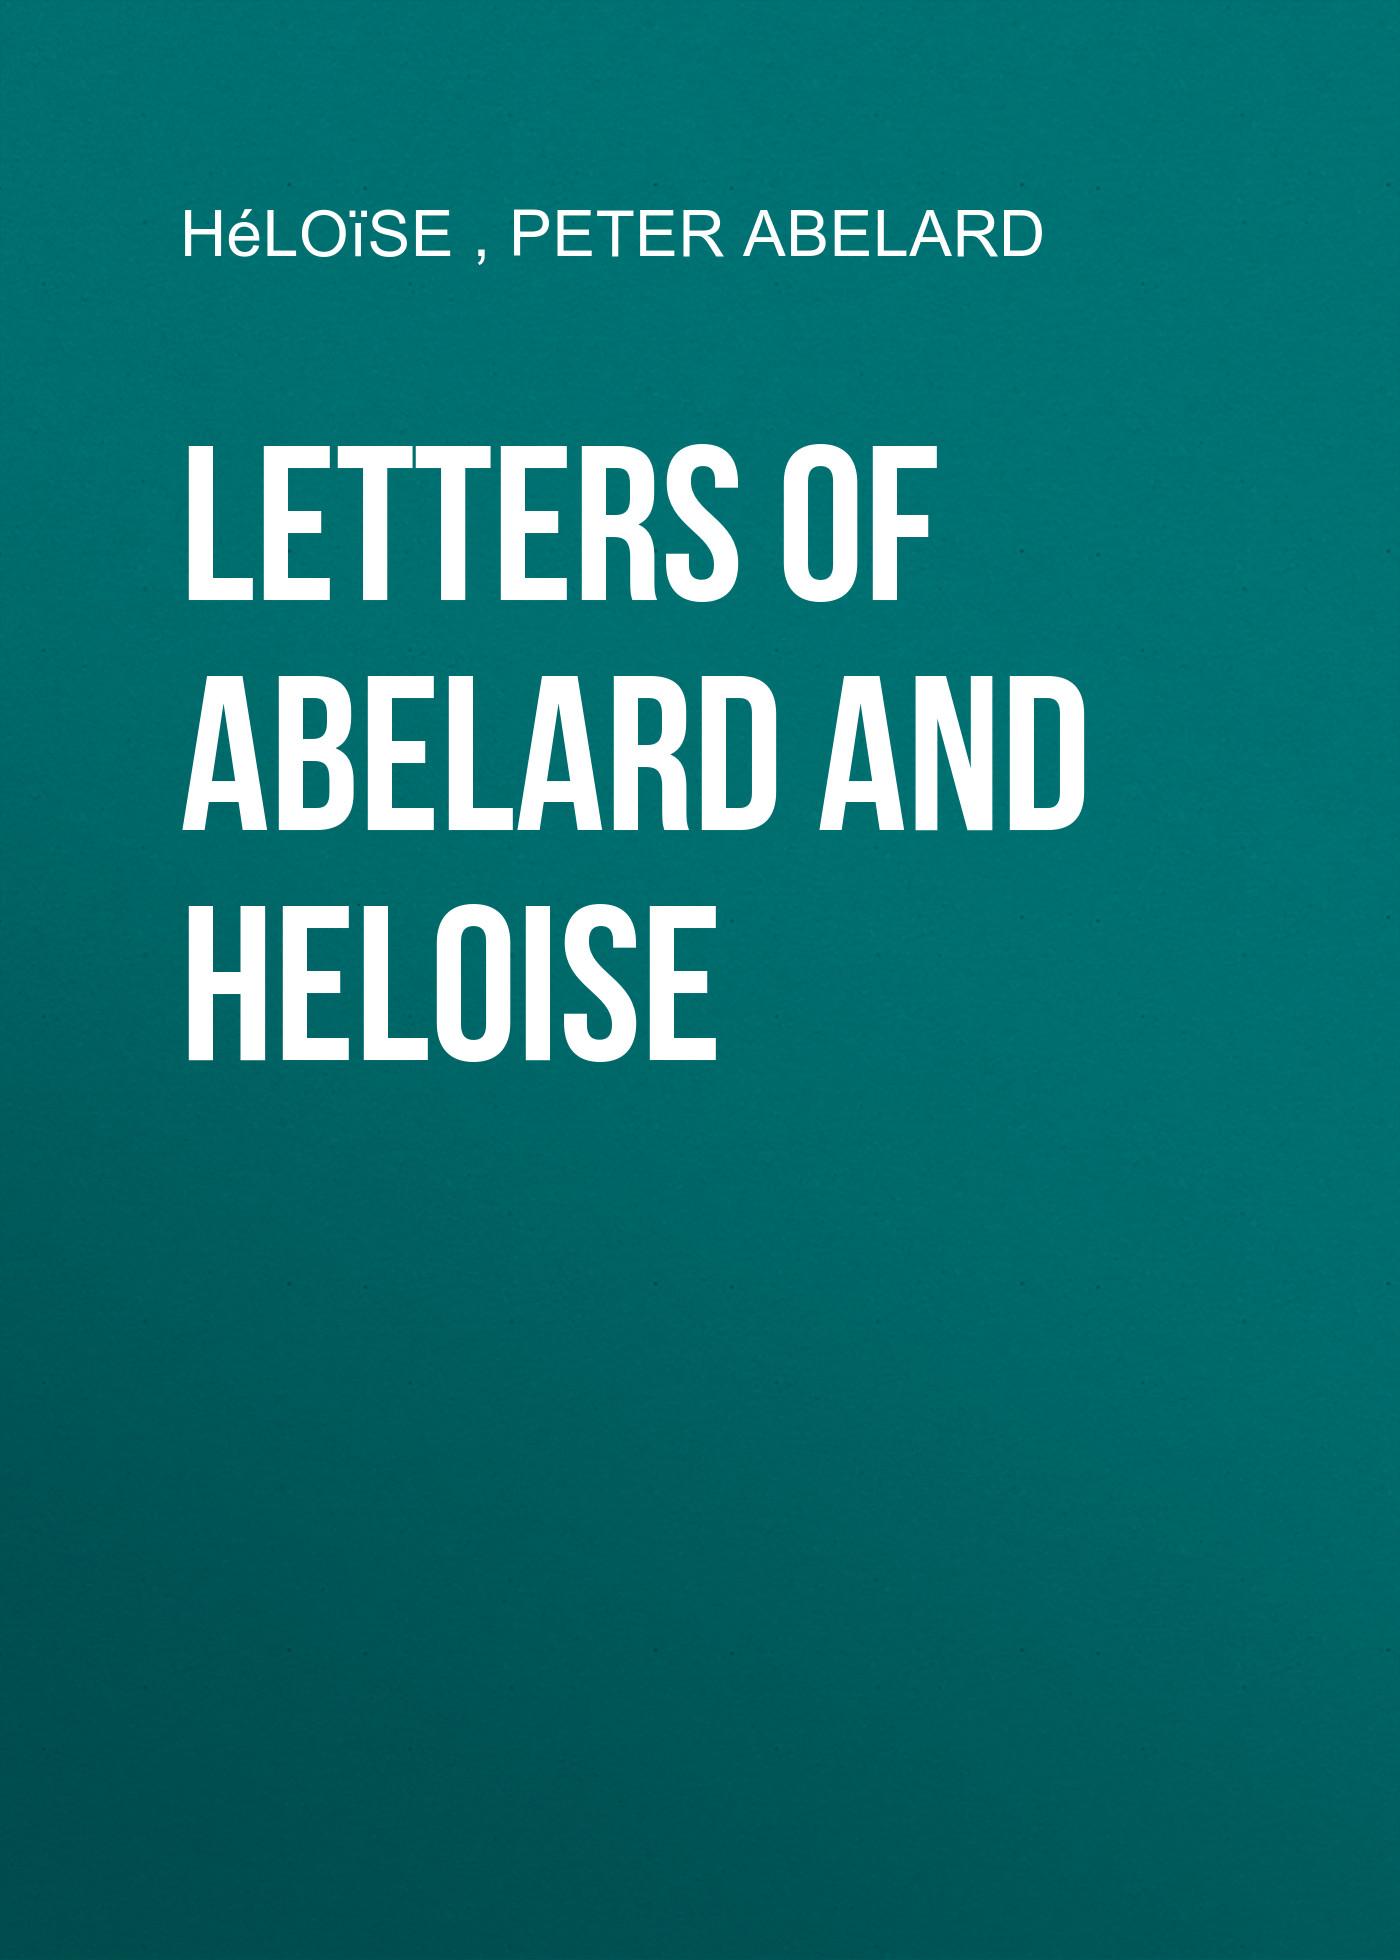 Peter Abelard Letters of Abelard and Heloise